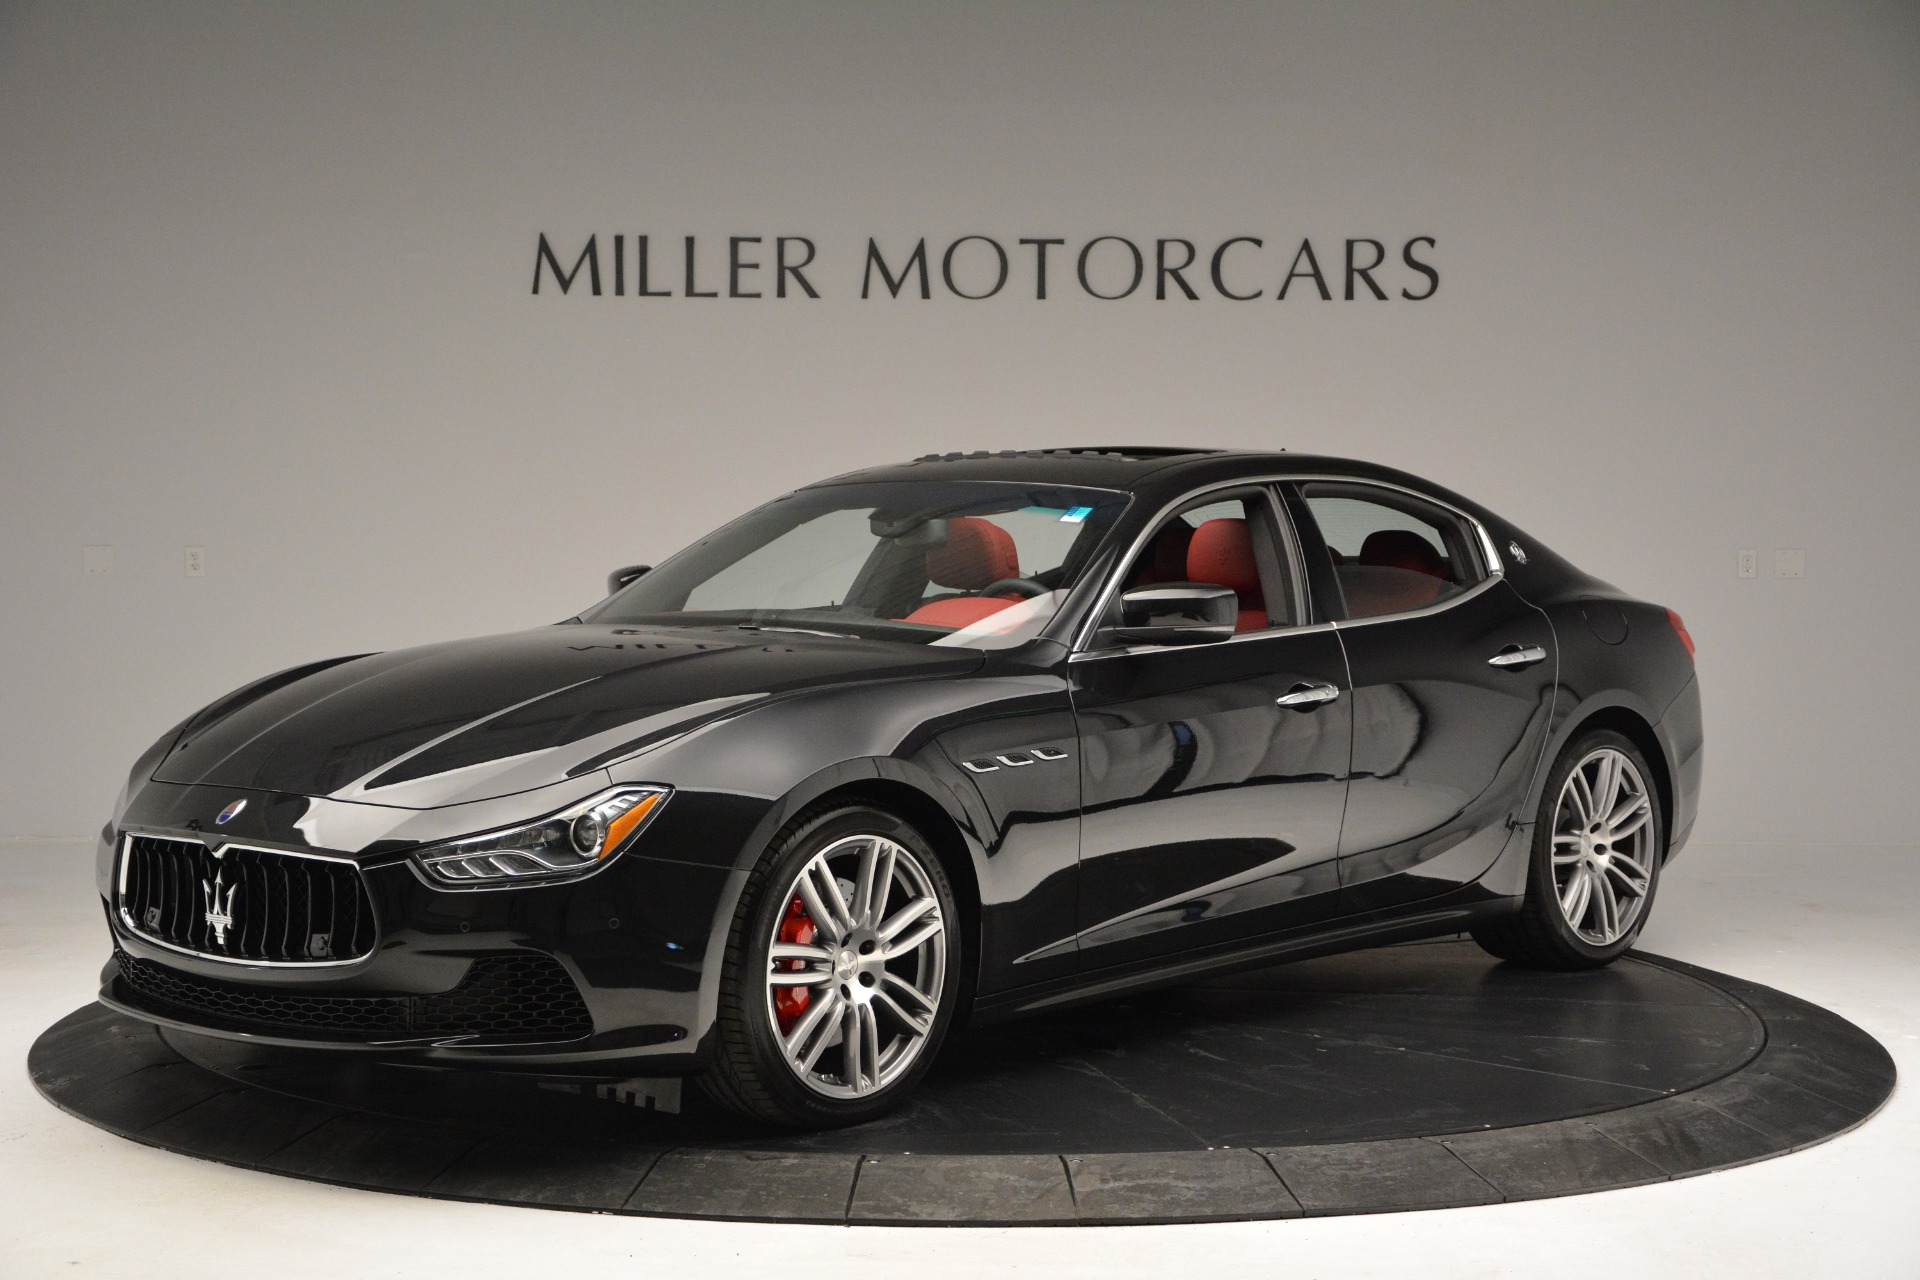 New 2017 Maserati Ghibli S Q4 For Sale ()   Miller Motorcars Stock #M1687